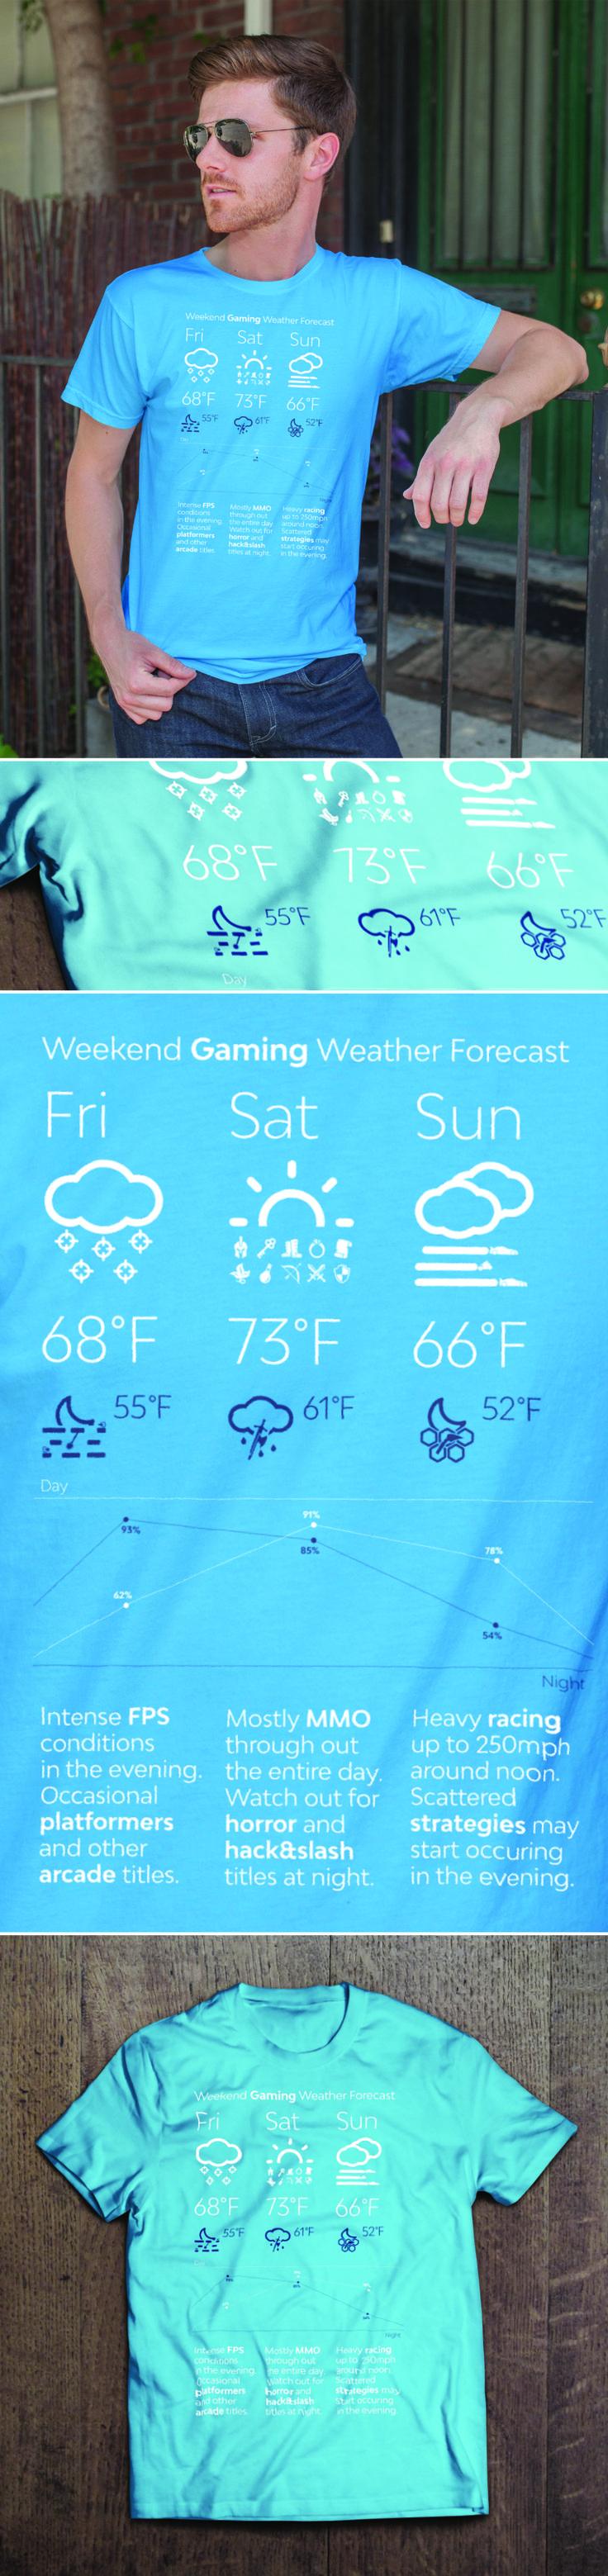 Weekend Gaming Weather Forecast on Teepbulic